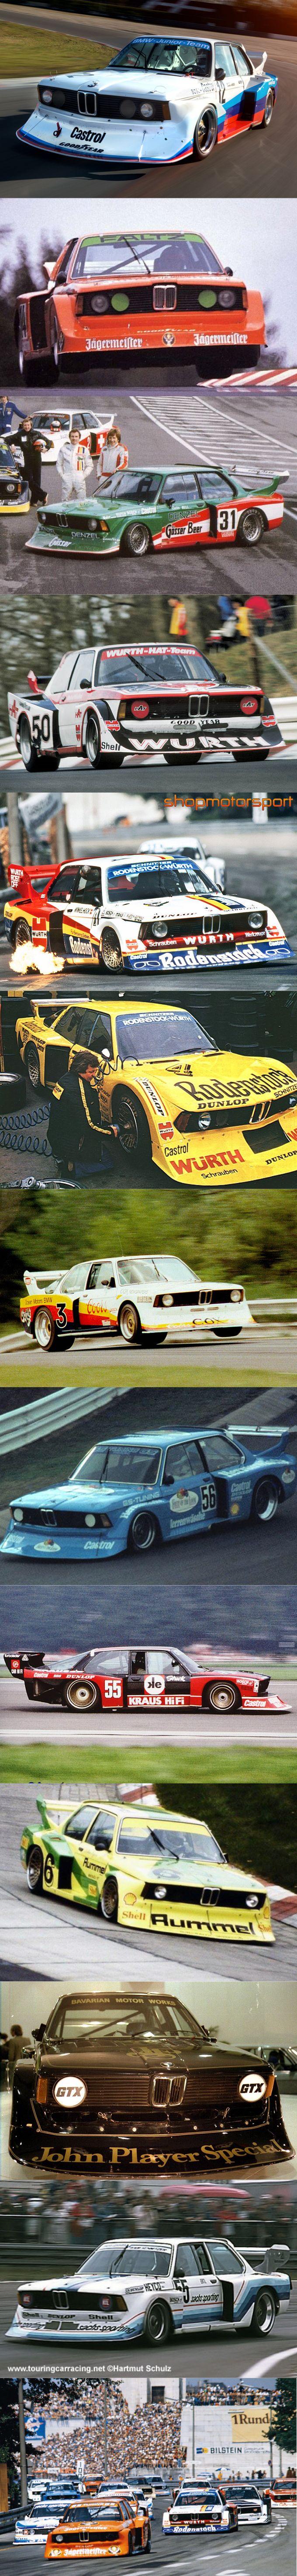 1977 BMW 320i Turbo Group 5 liveries / Motorsport / Jägermeister / Gösser Beer / Würth / Rodenstock (2x) / Coors / Fruit of the Loom / Kraus Hifi / Rummel / JPS / Sachs